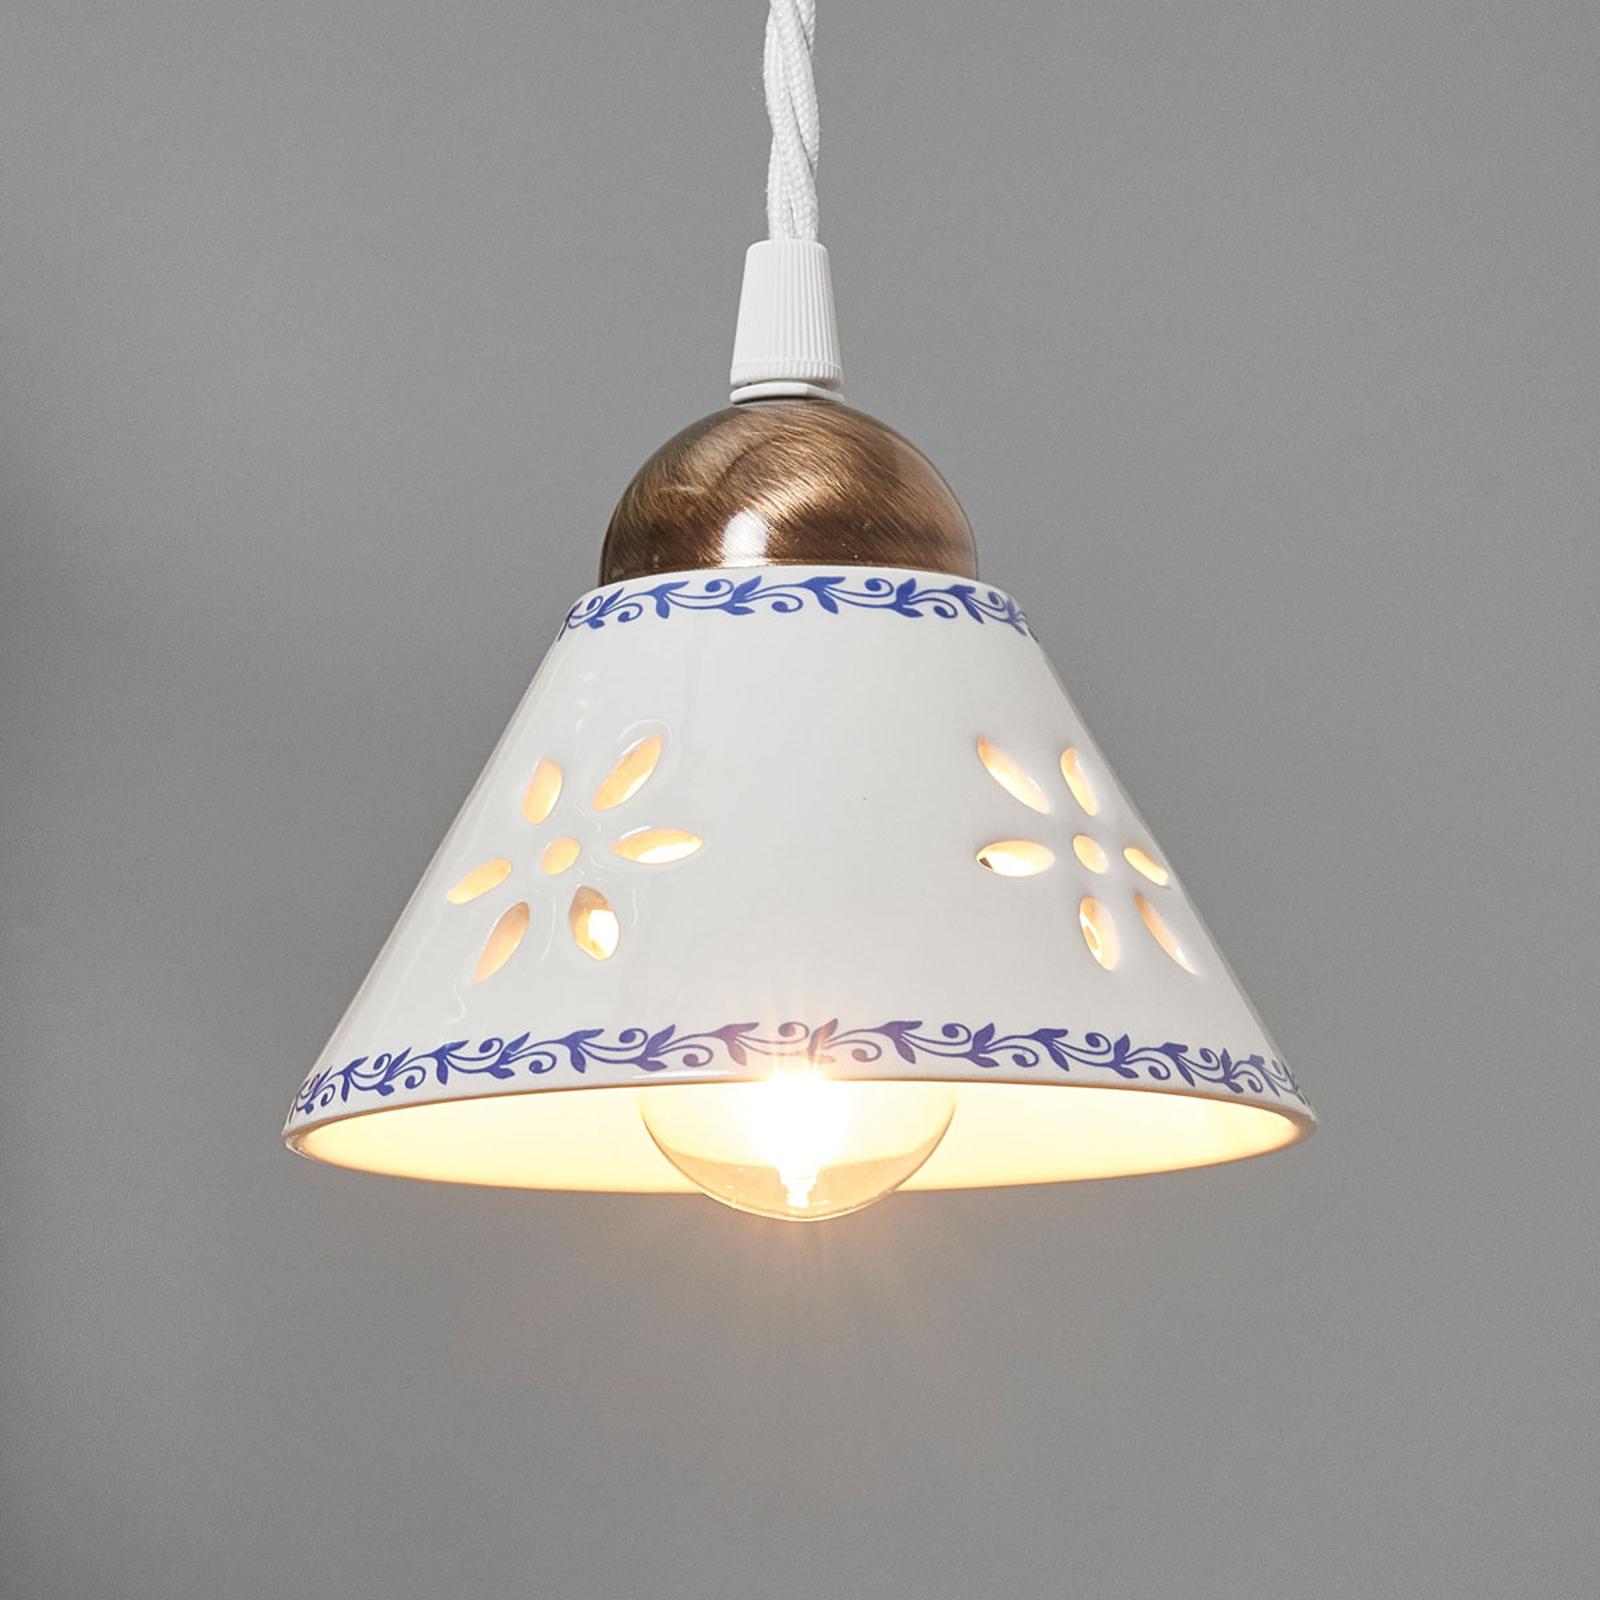 Hængelampe NONNA i hvid keramik